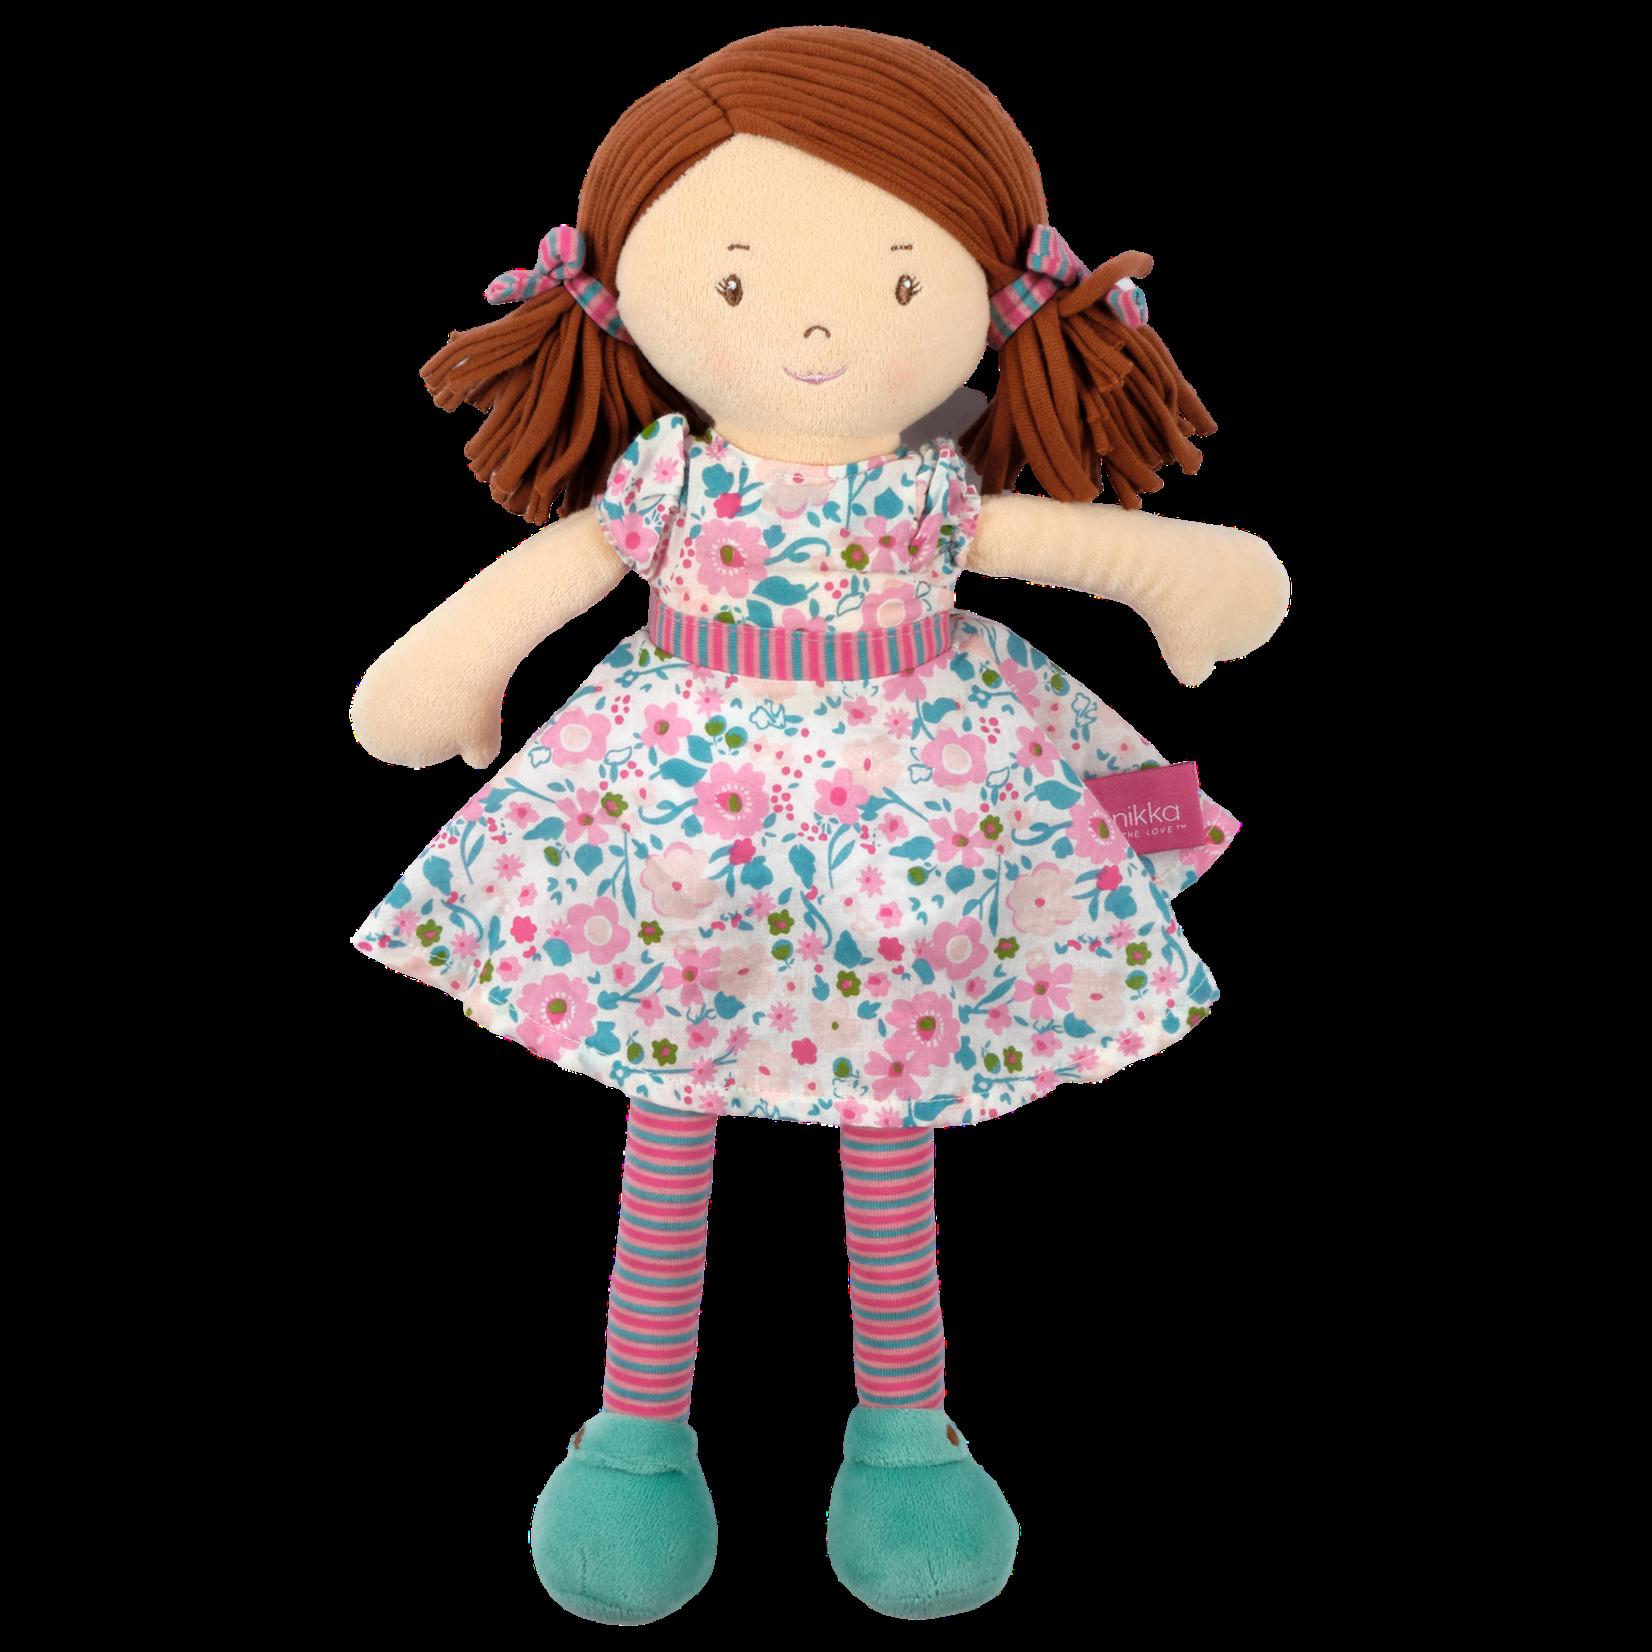 Tikiri Toys Katy Doll - Dark Brown Hair with Pink and  sea Green Dress